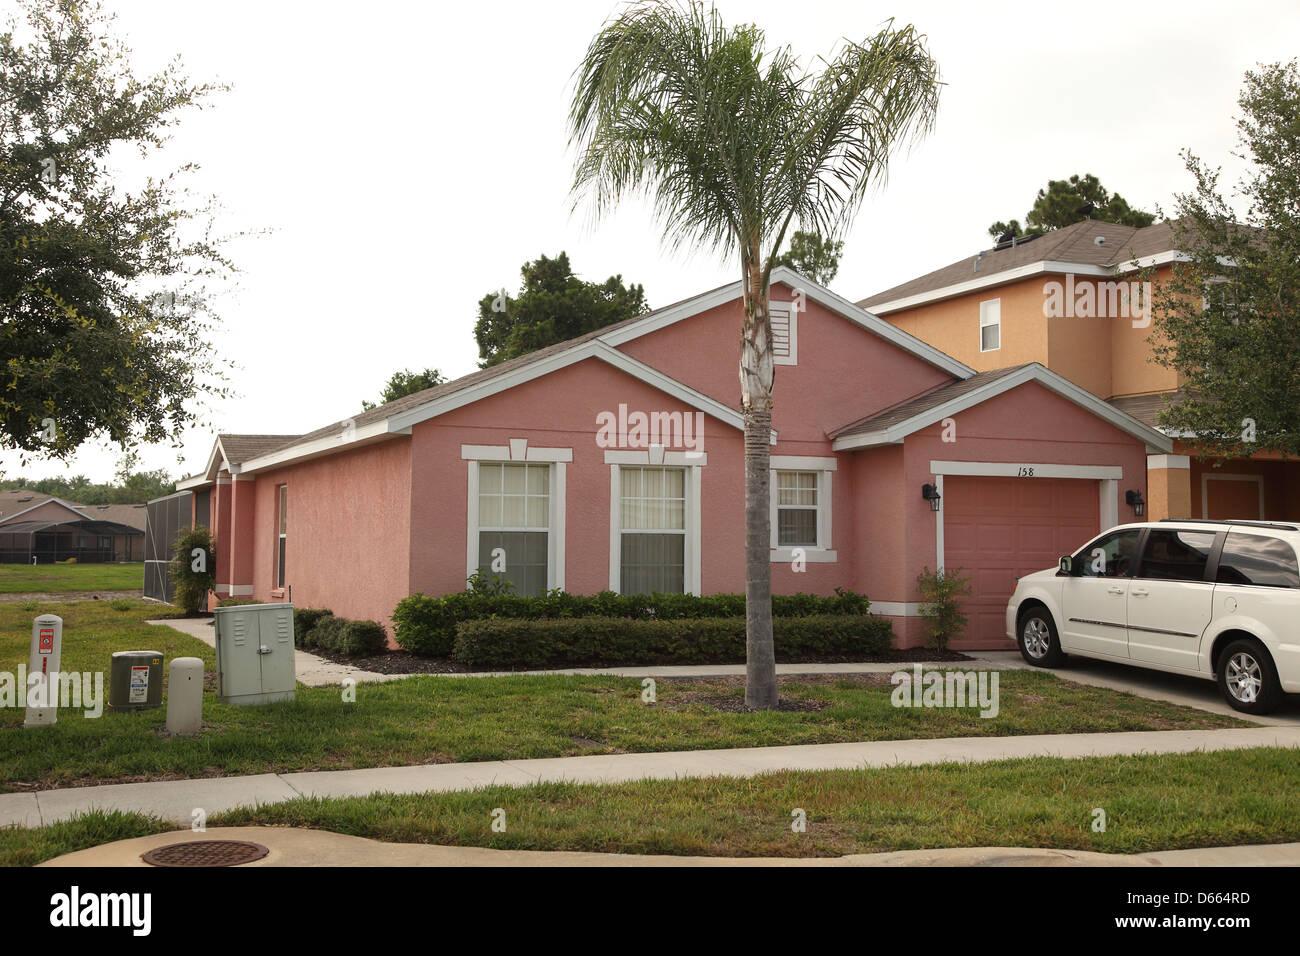 modern american villa home in florida in a smart residential estate